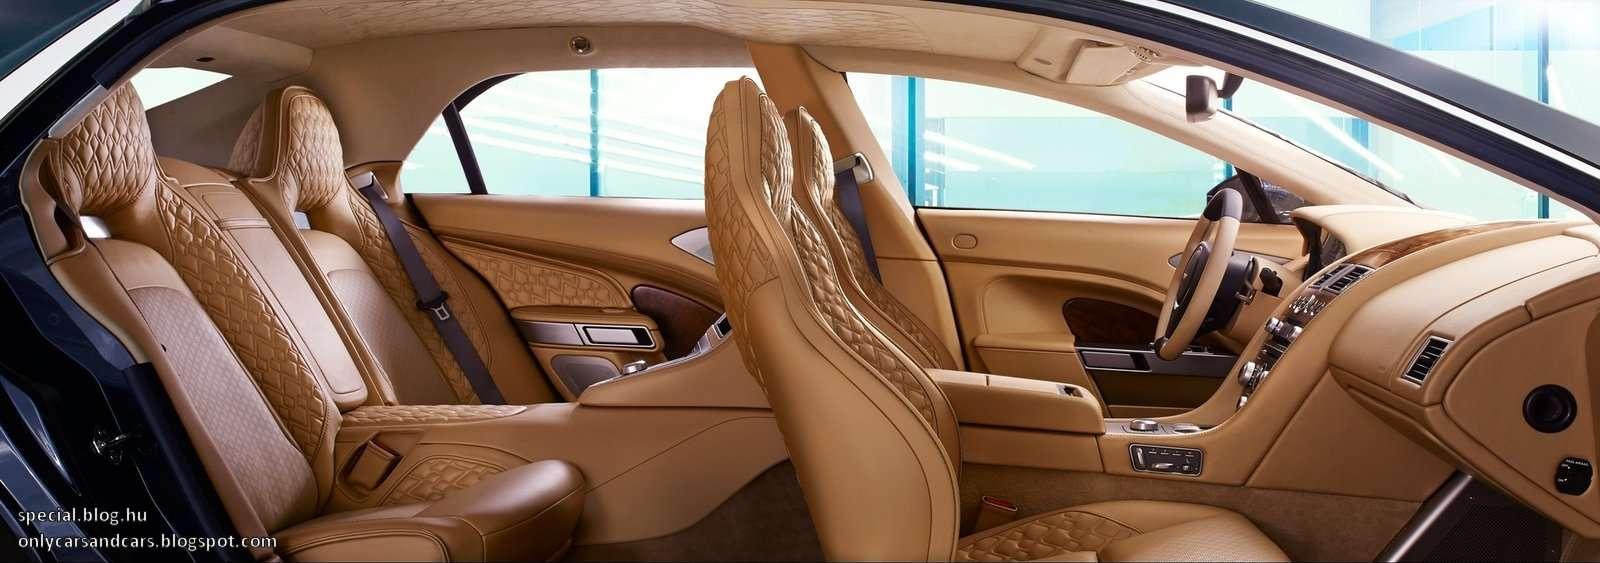 Aston Martin Lagonda 2016 Only Cars And Cars